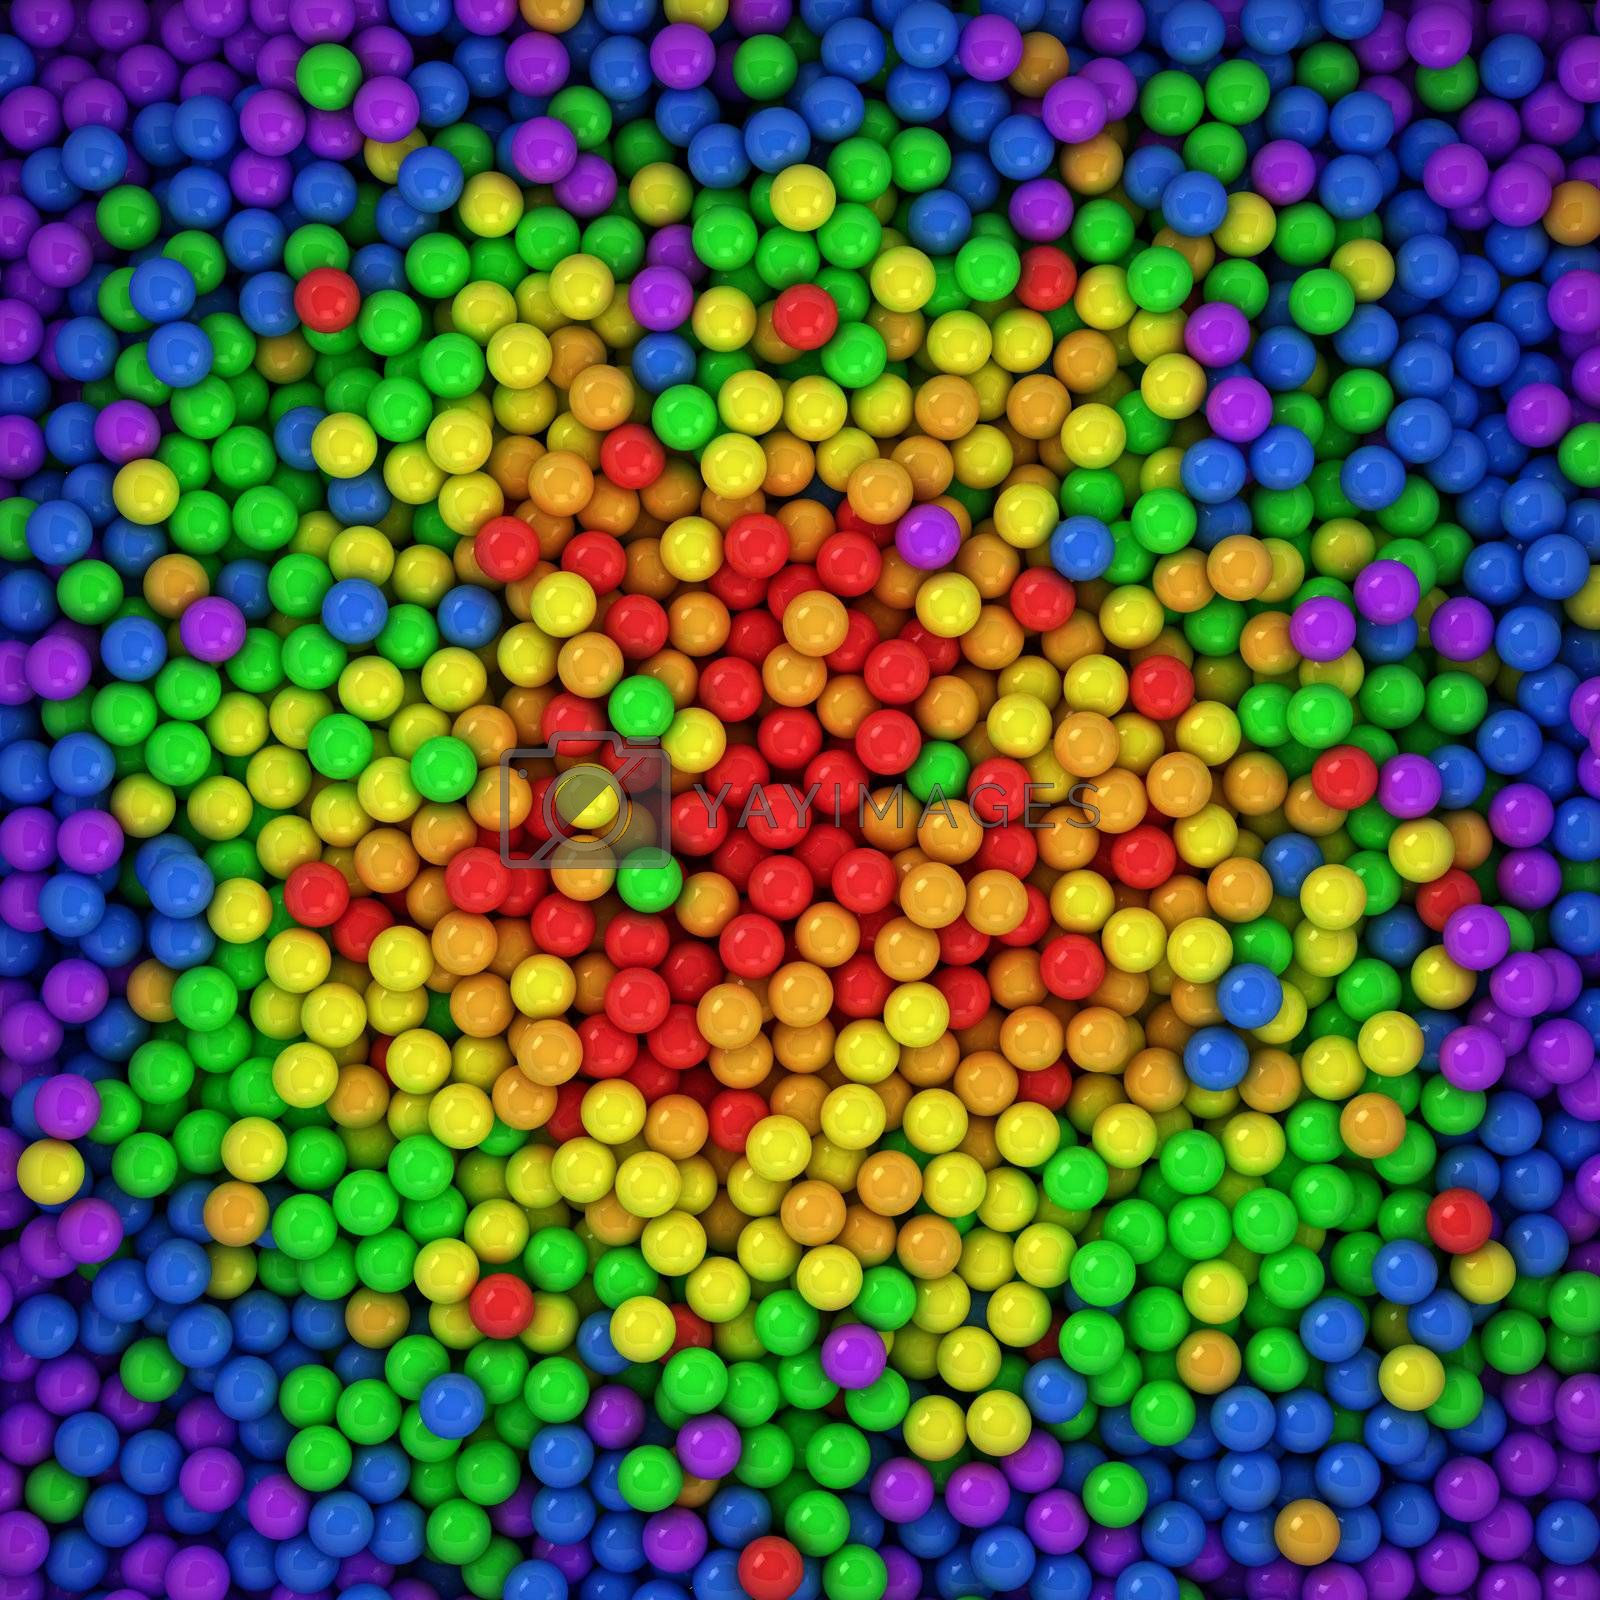 Spectrum balls background, three-dimensional computer graphic